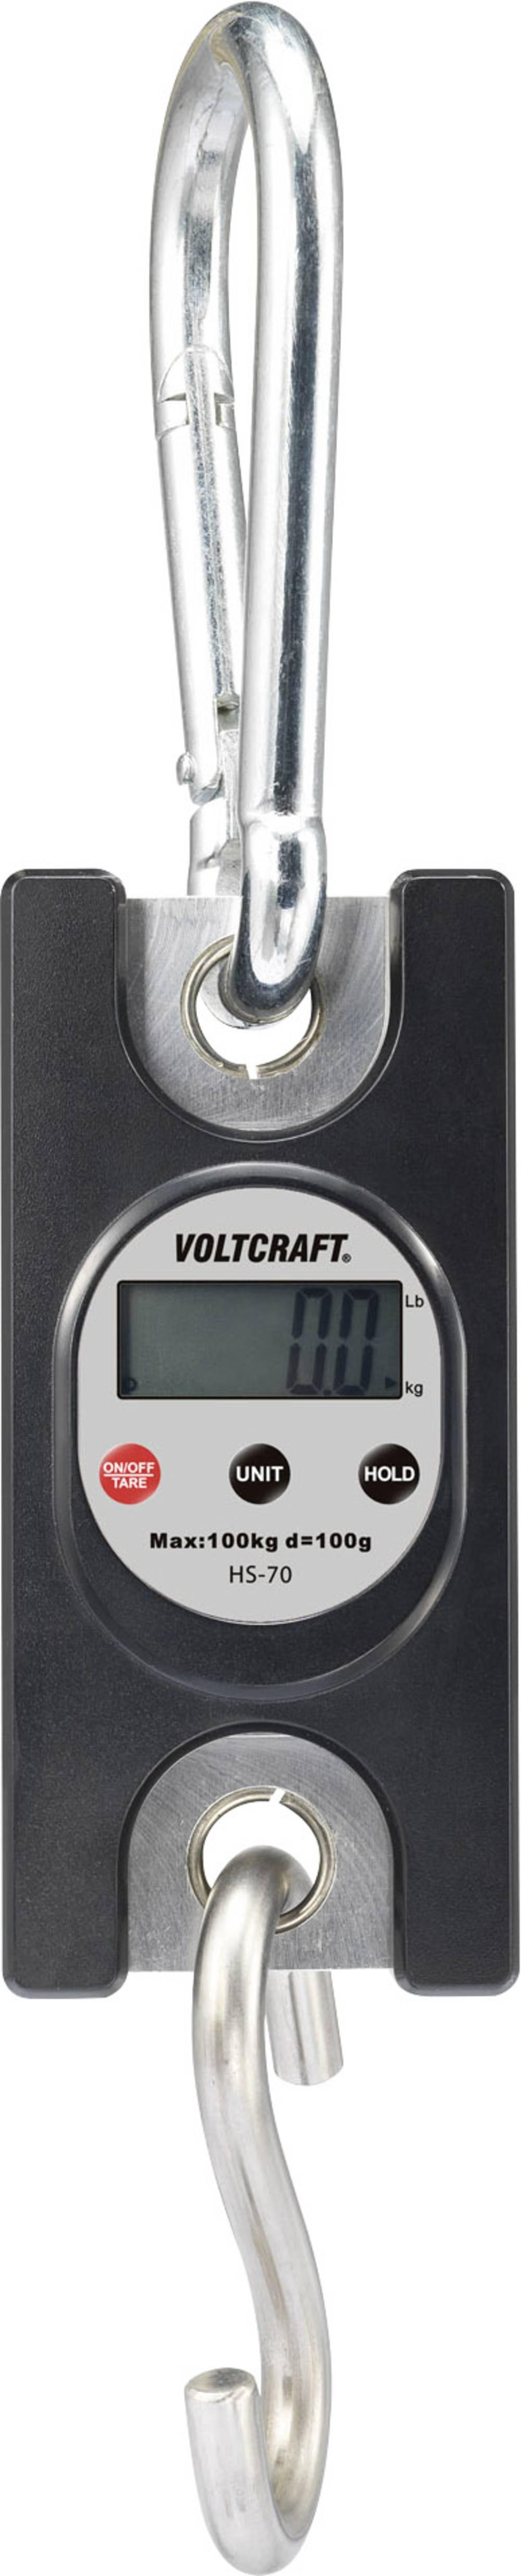 Viseča tehtnica VOLTCRAFT HS-70 območje tehtanja (maks.) 100 kg natančnost 100 g črne barve